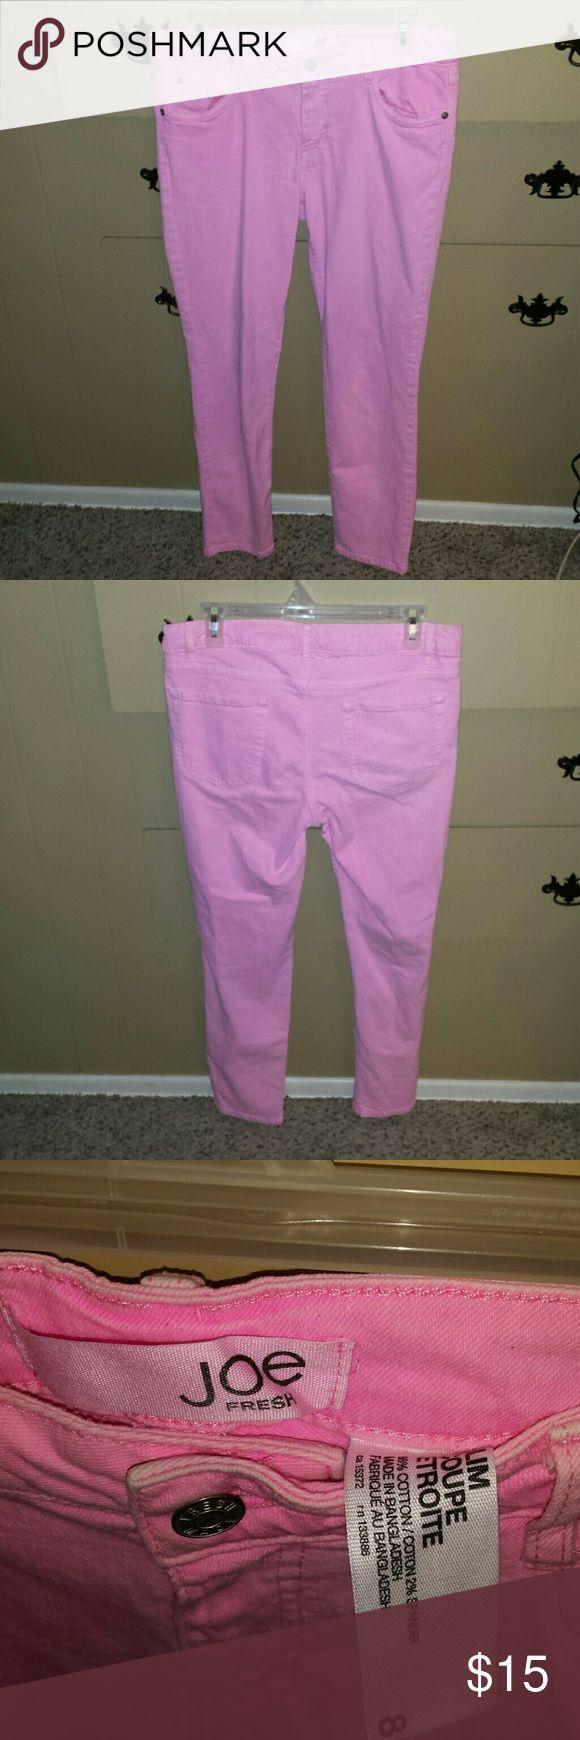 Pink Joe slim jeans Pink Joe slim jeans. They are in very good condition. Size 8 Joe Fresh Jeans Skinny